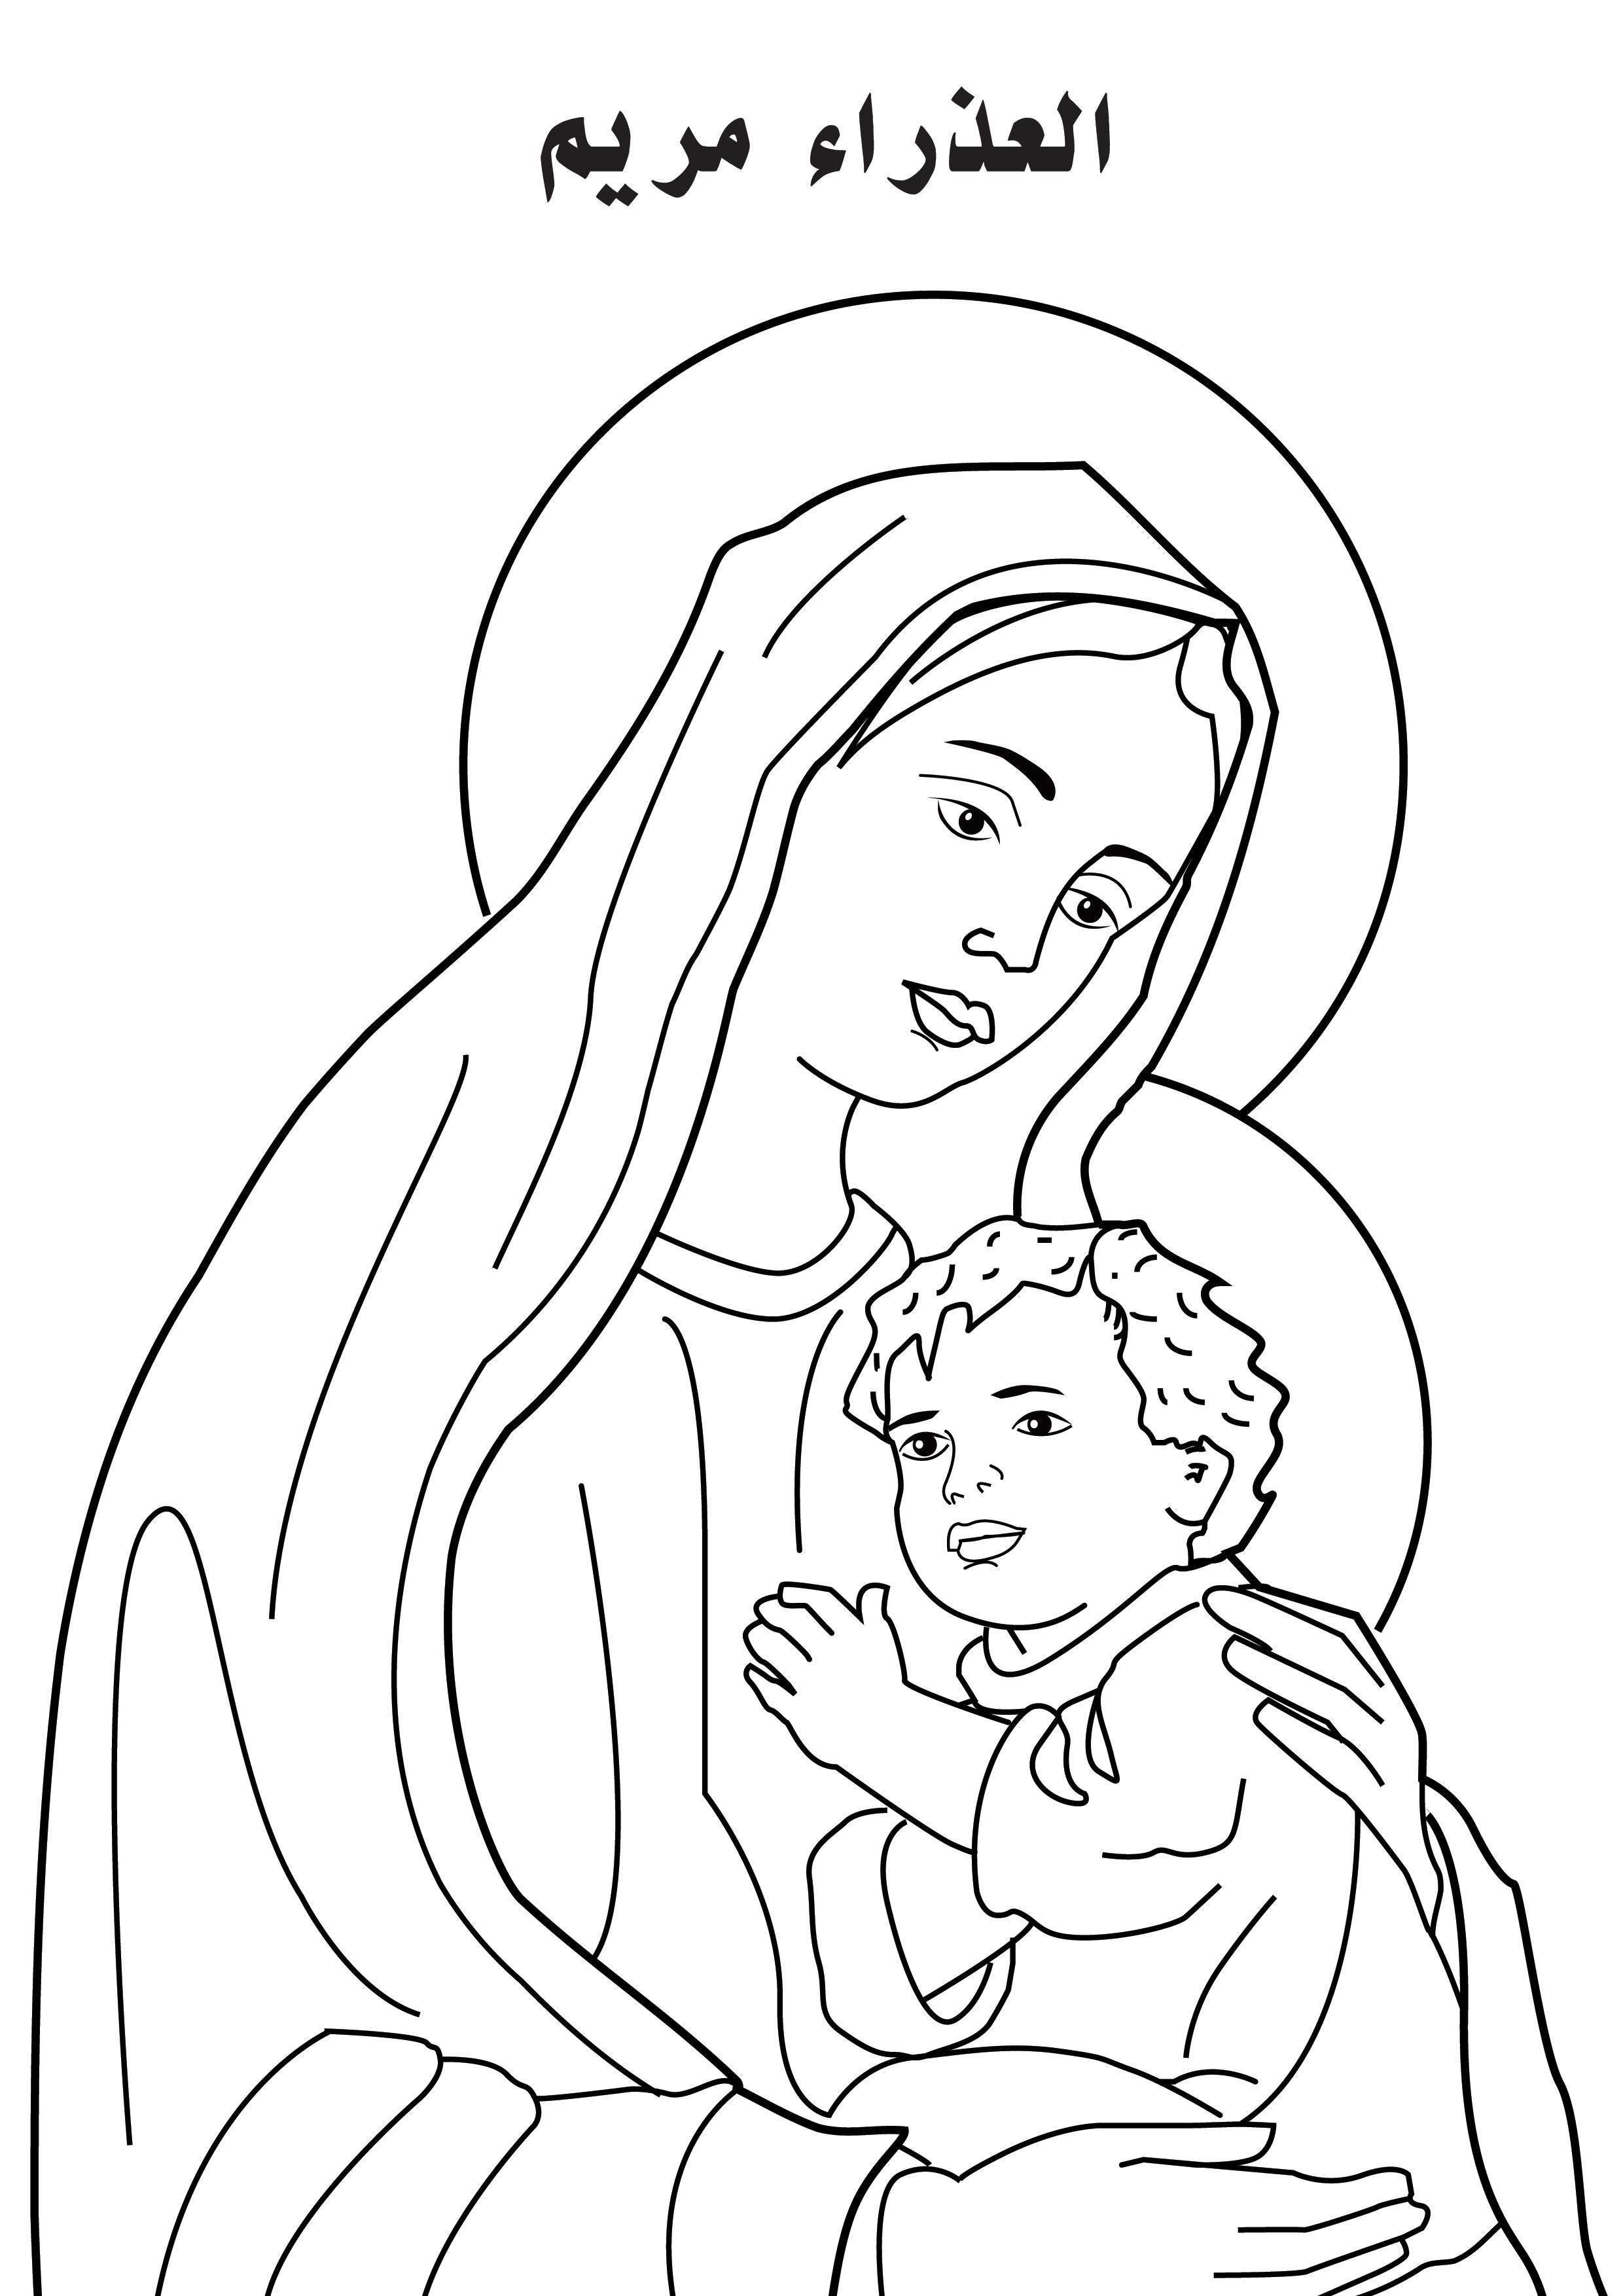 Image: Coloring St Mary 2 صورة تلوين للسيدة العذراء مريم